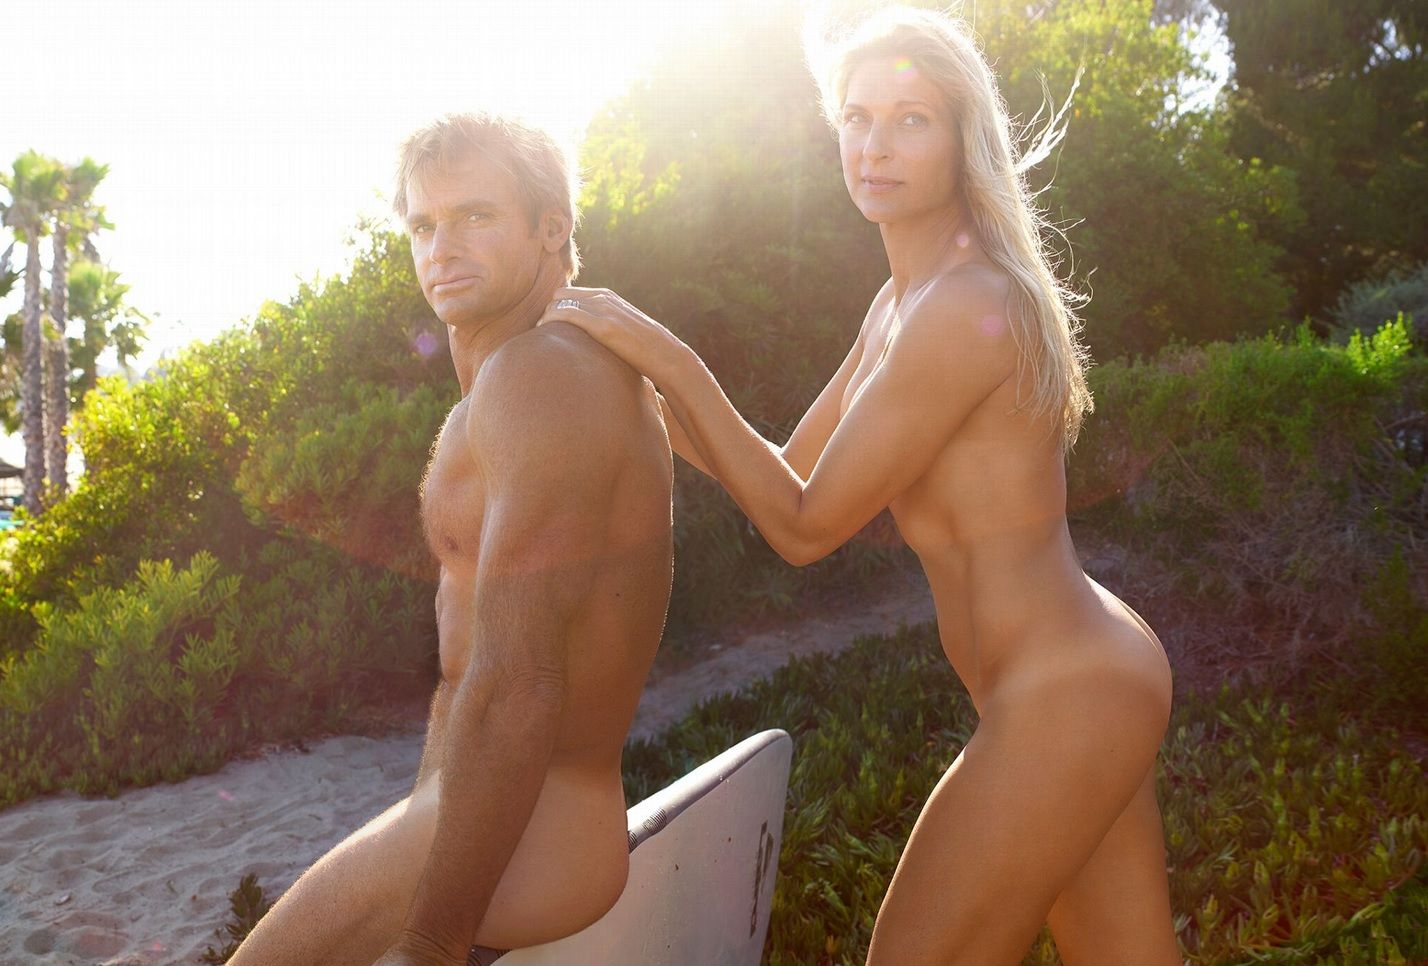 Nude amanda bingson 10 times